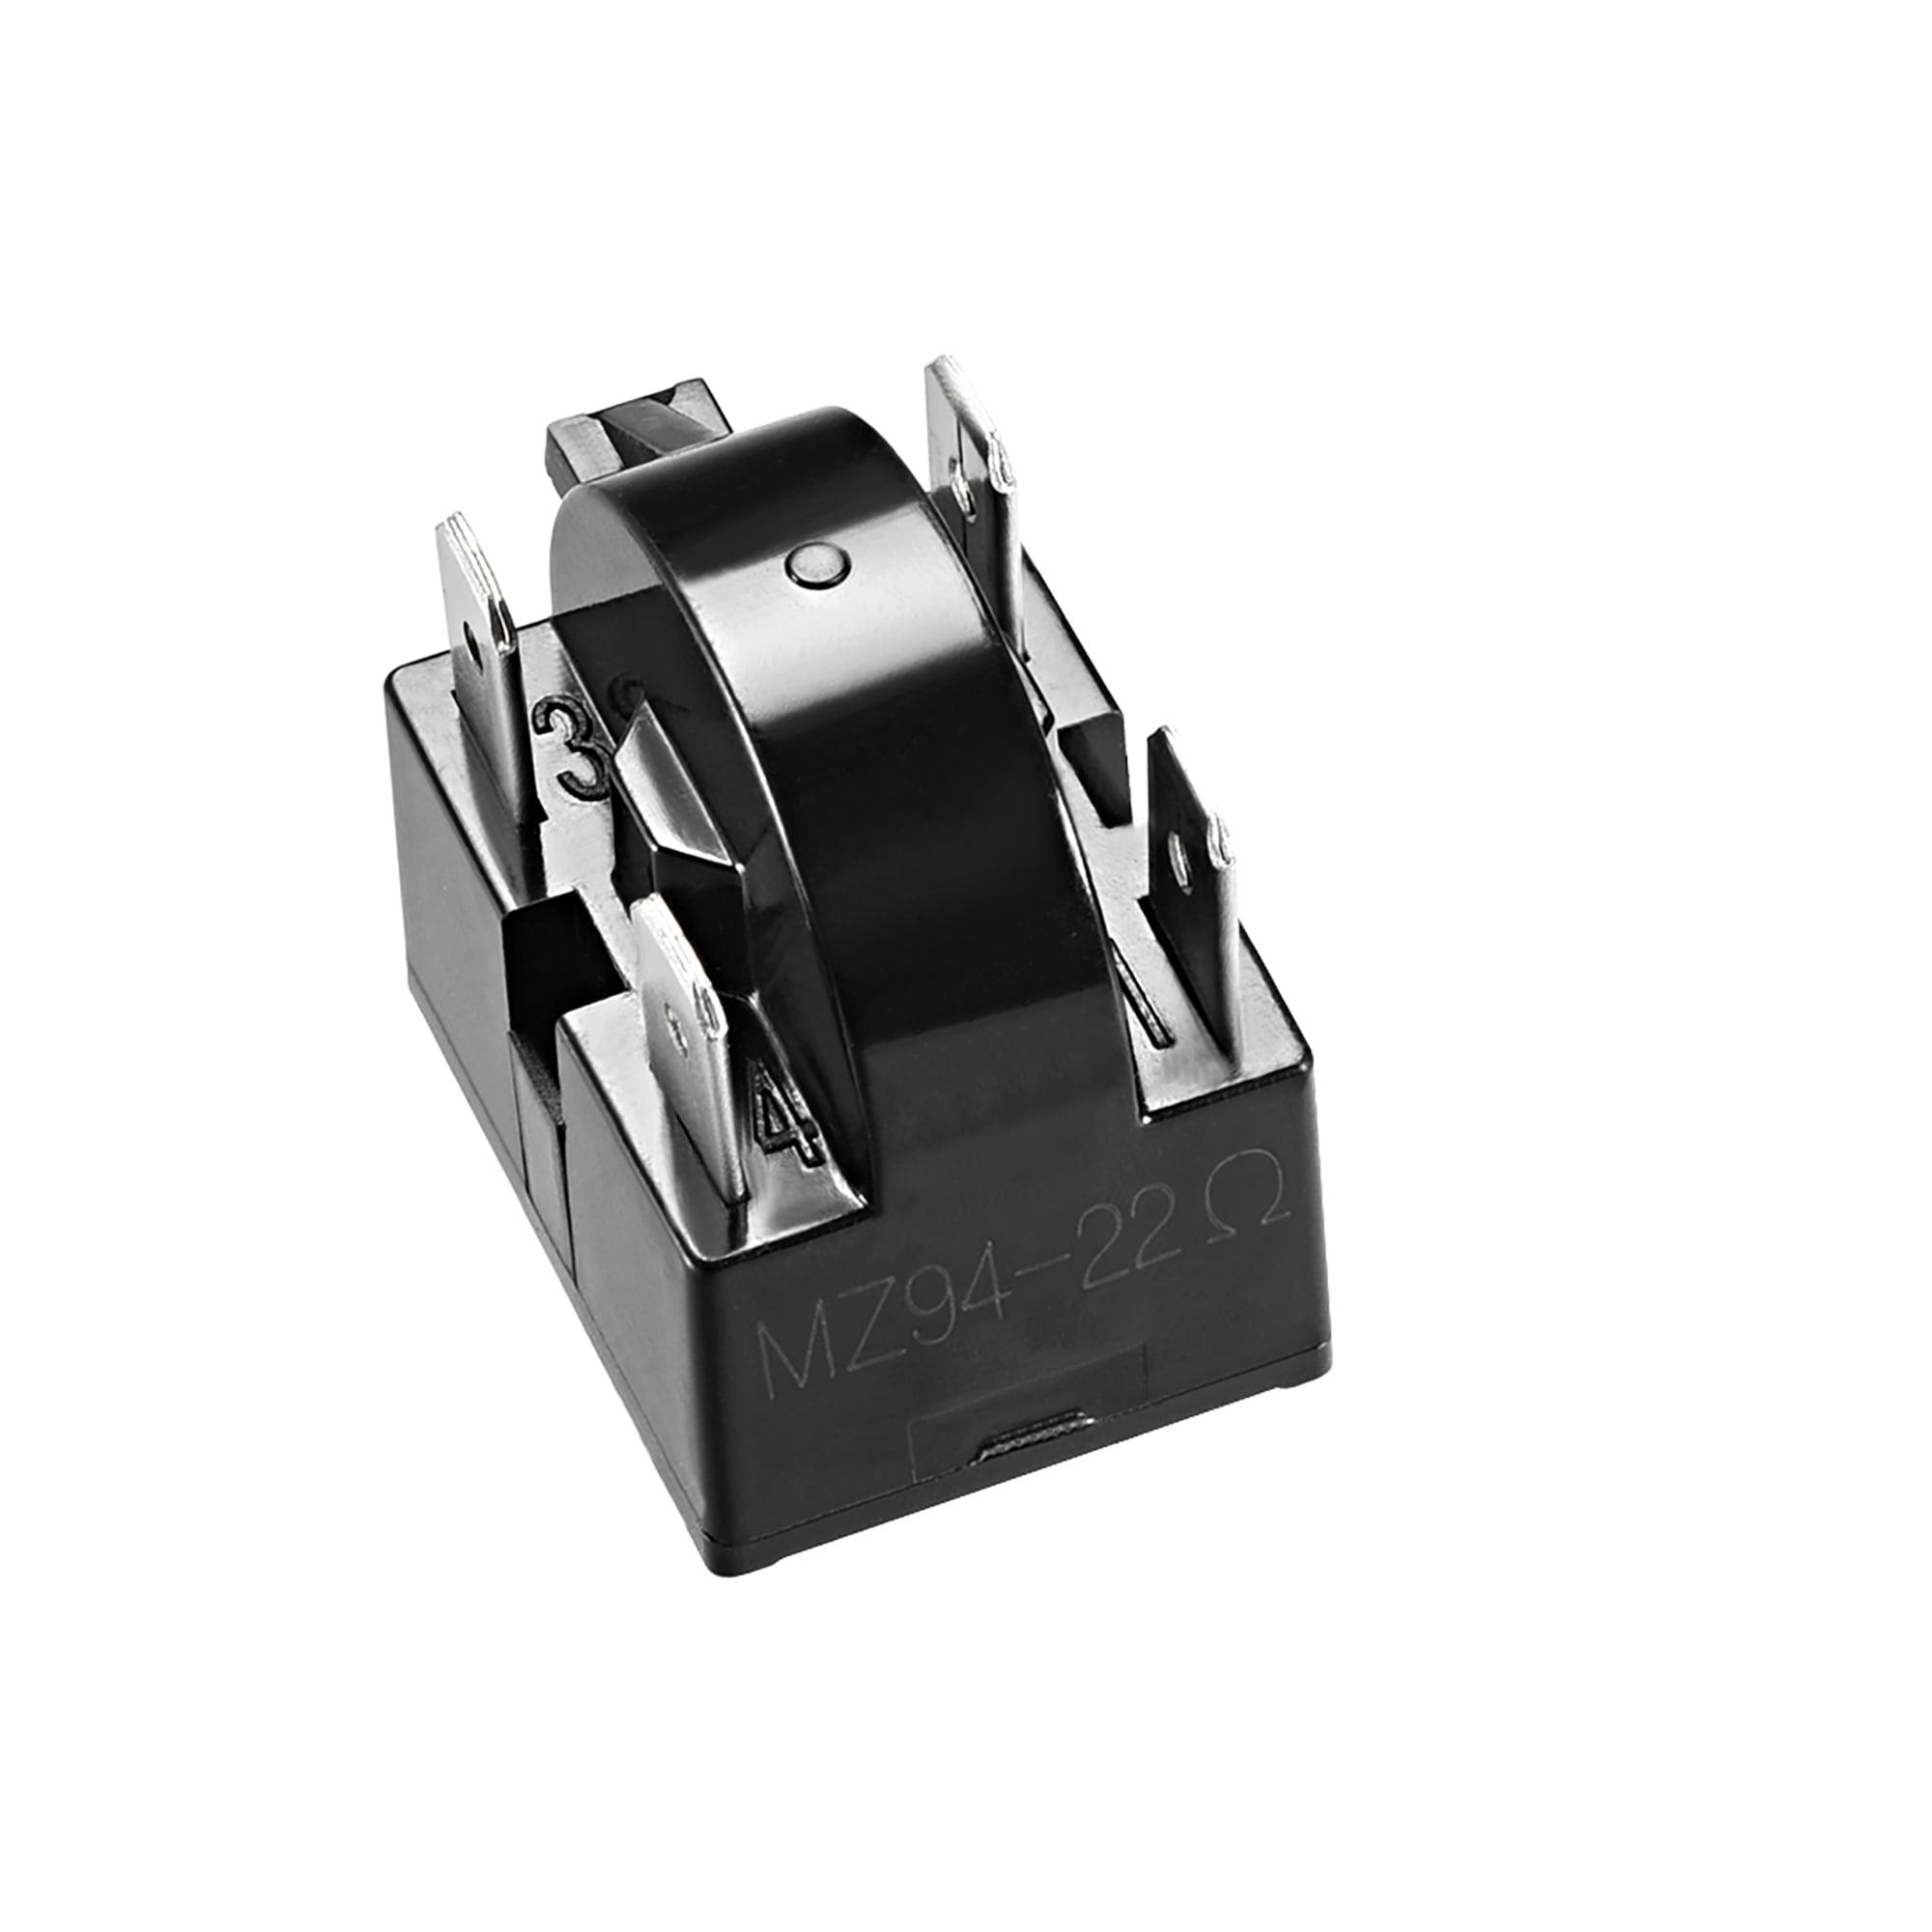 2 Pcs 22 Ohm 4 Pin Refrigerator PTC Starter Relay Black - image 2 of 4